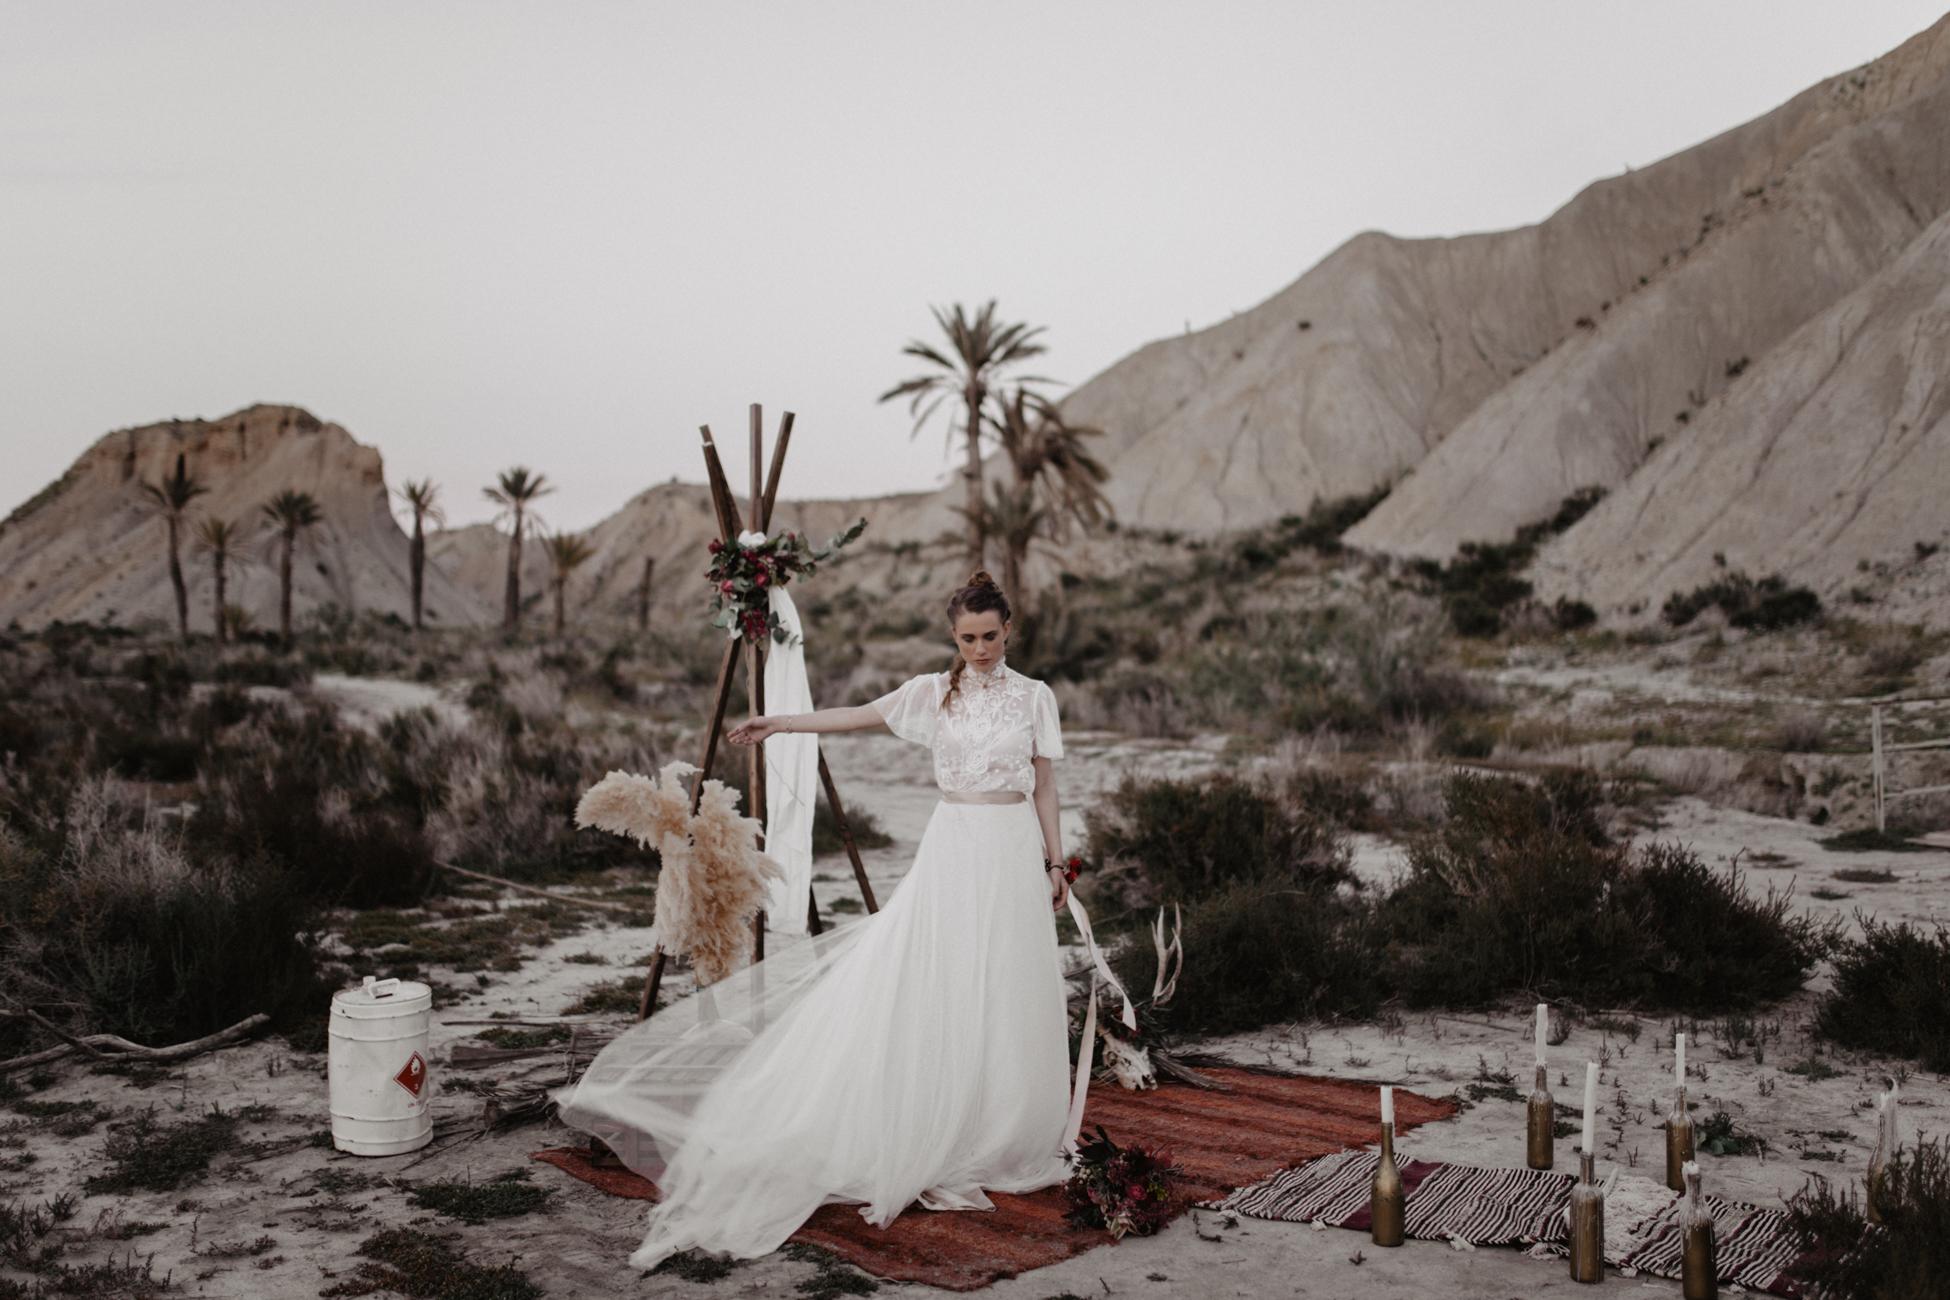 thenortherngirlphotography_photography_thenortherngirl_rebeccascabros_wedding_weddingphotography_weddingphotographer_wood_muebles_deco_bodasdecaramelo_home_bedtime_gaywedding_editorial_desierto_desert_wildestdreams_amortexano-454.jpg